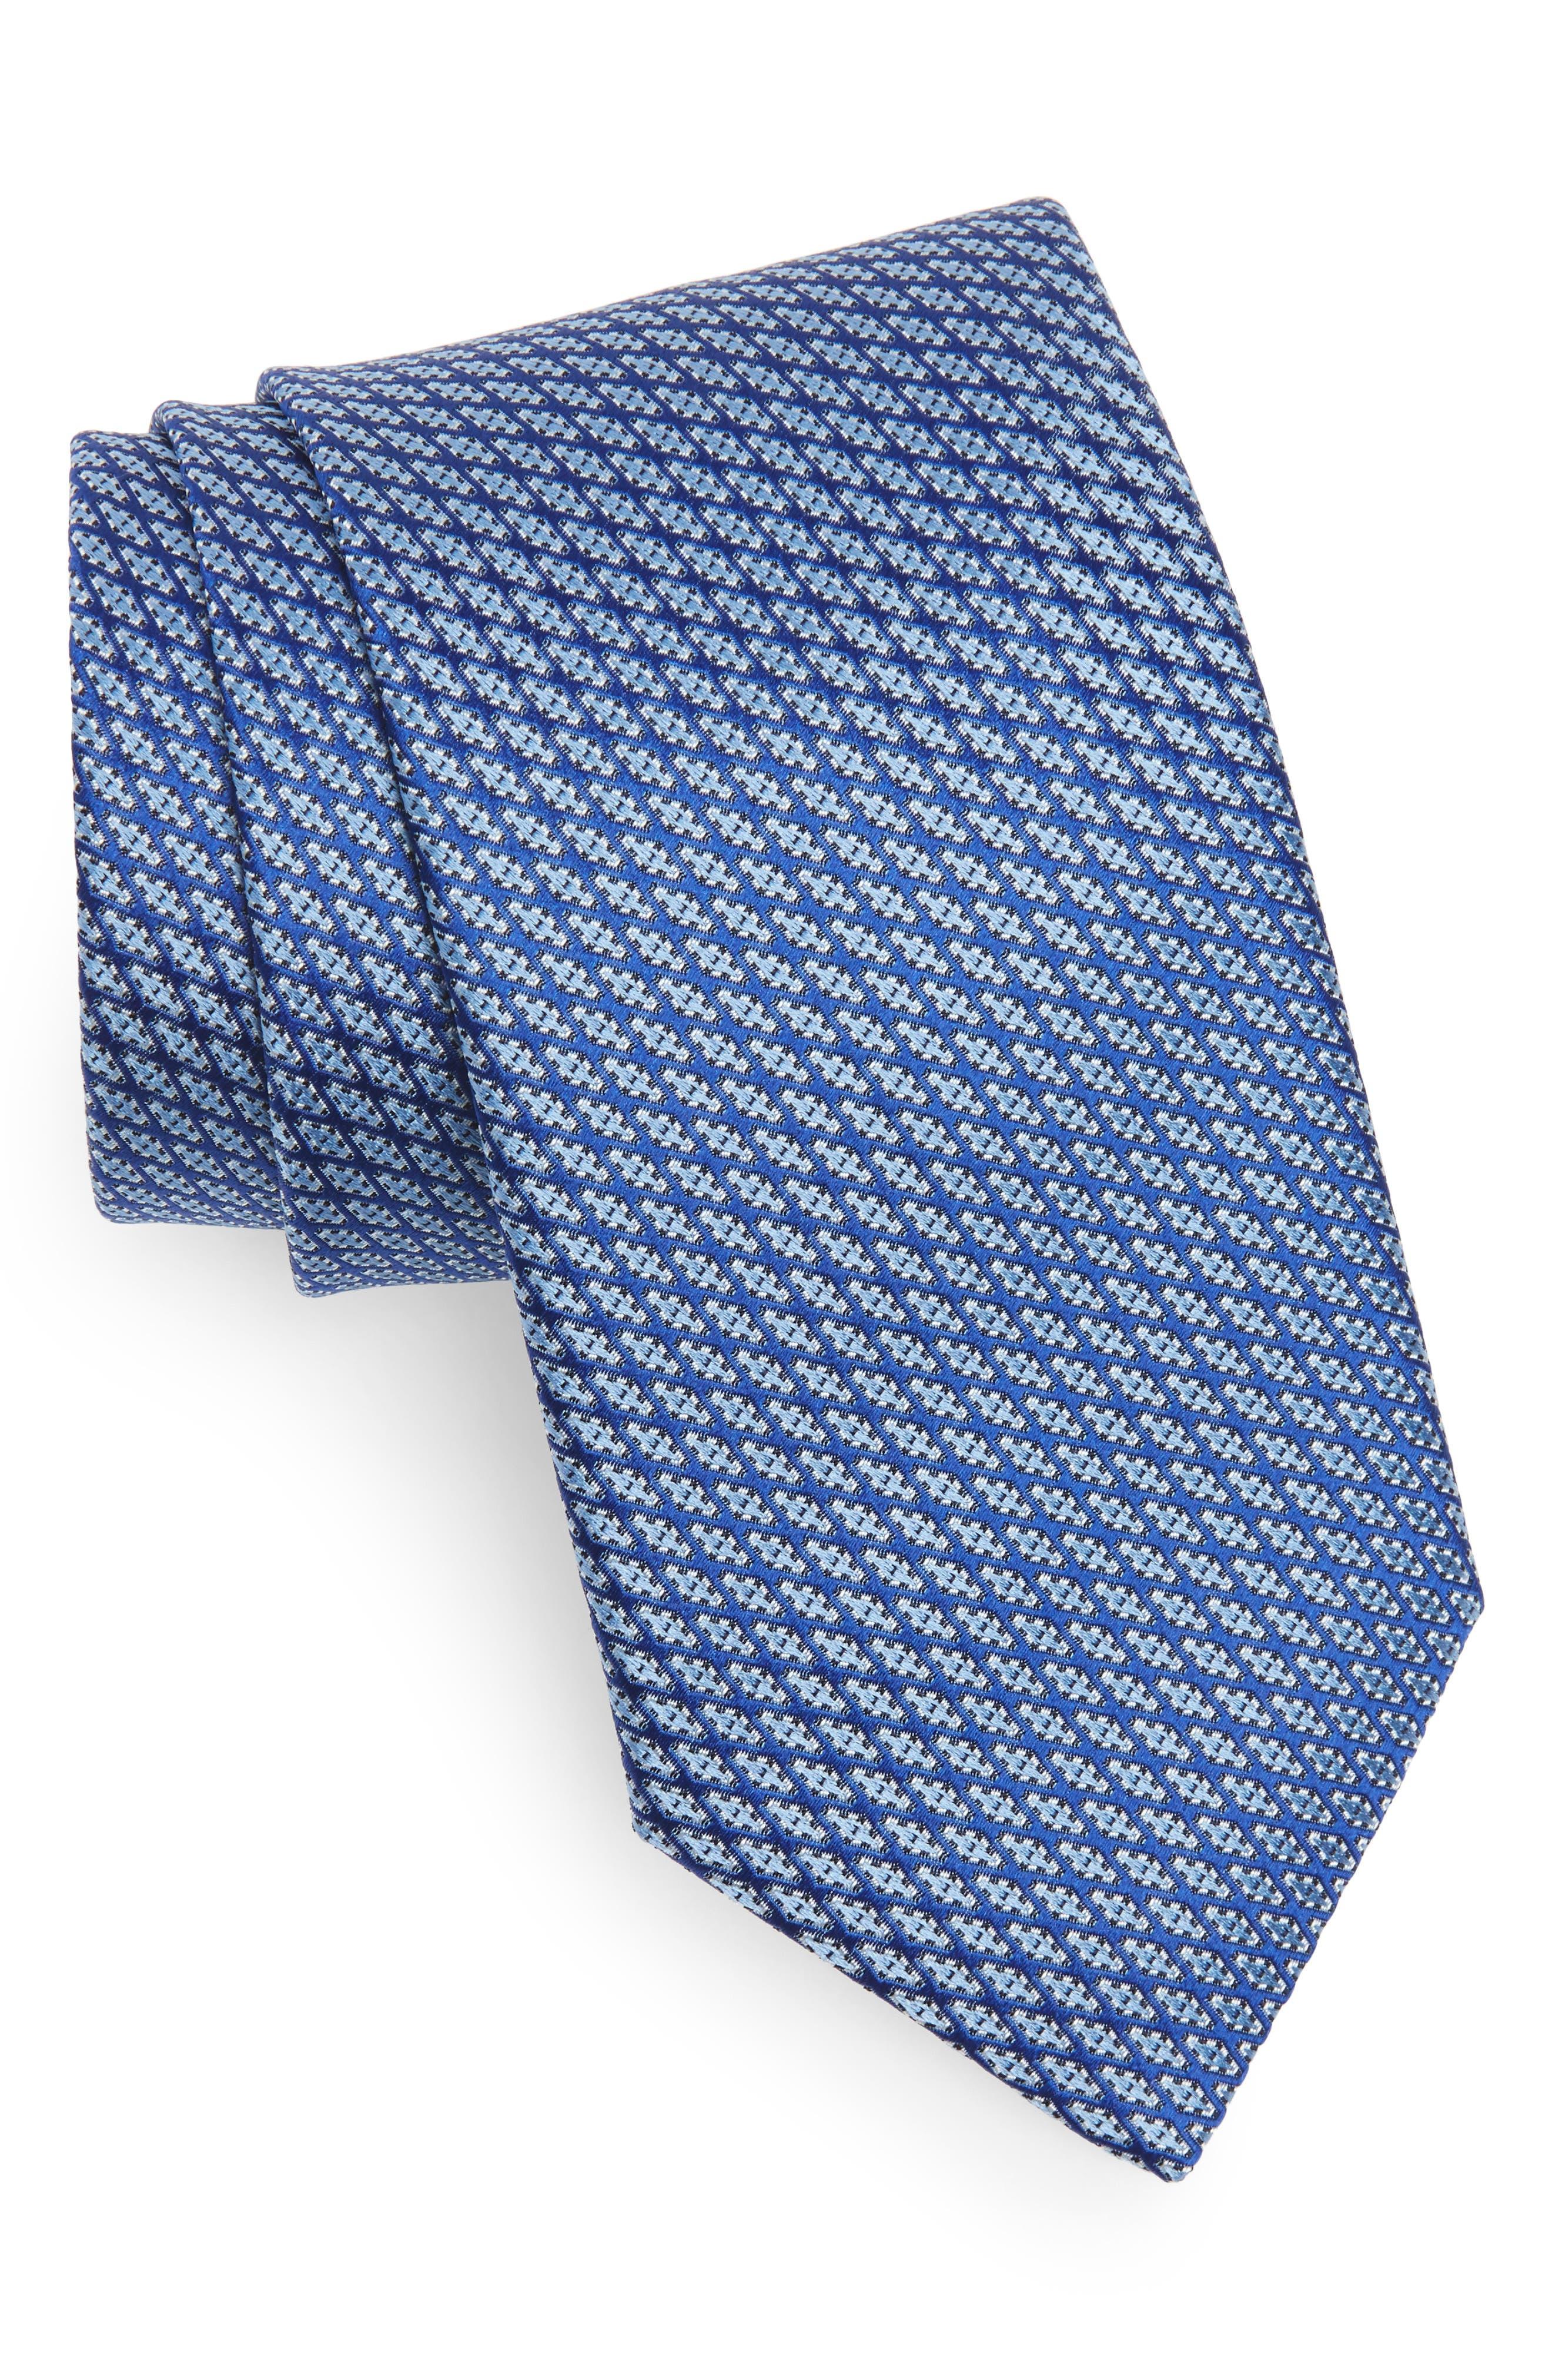 Neat Silk Tie,                         Main,                         color, 410